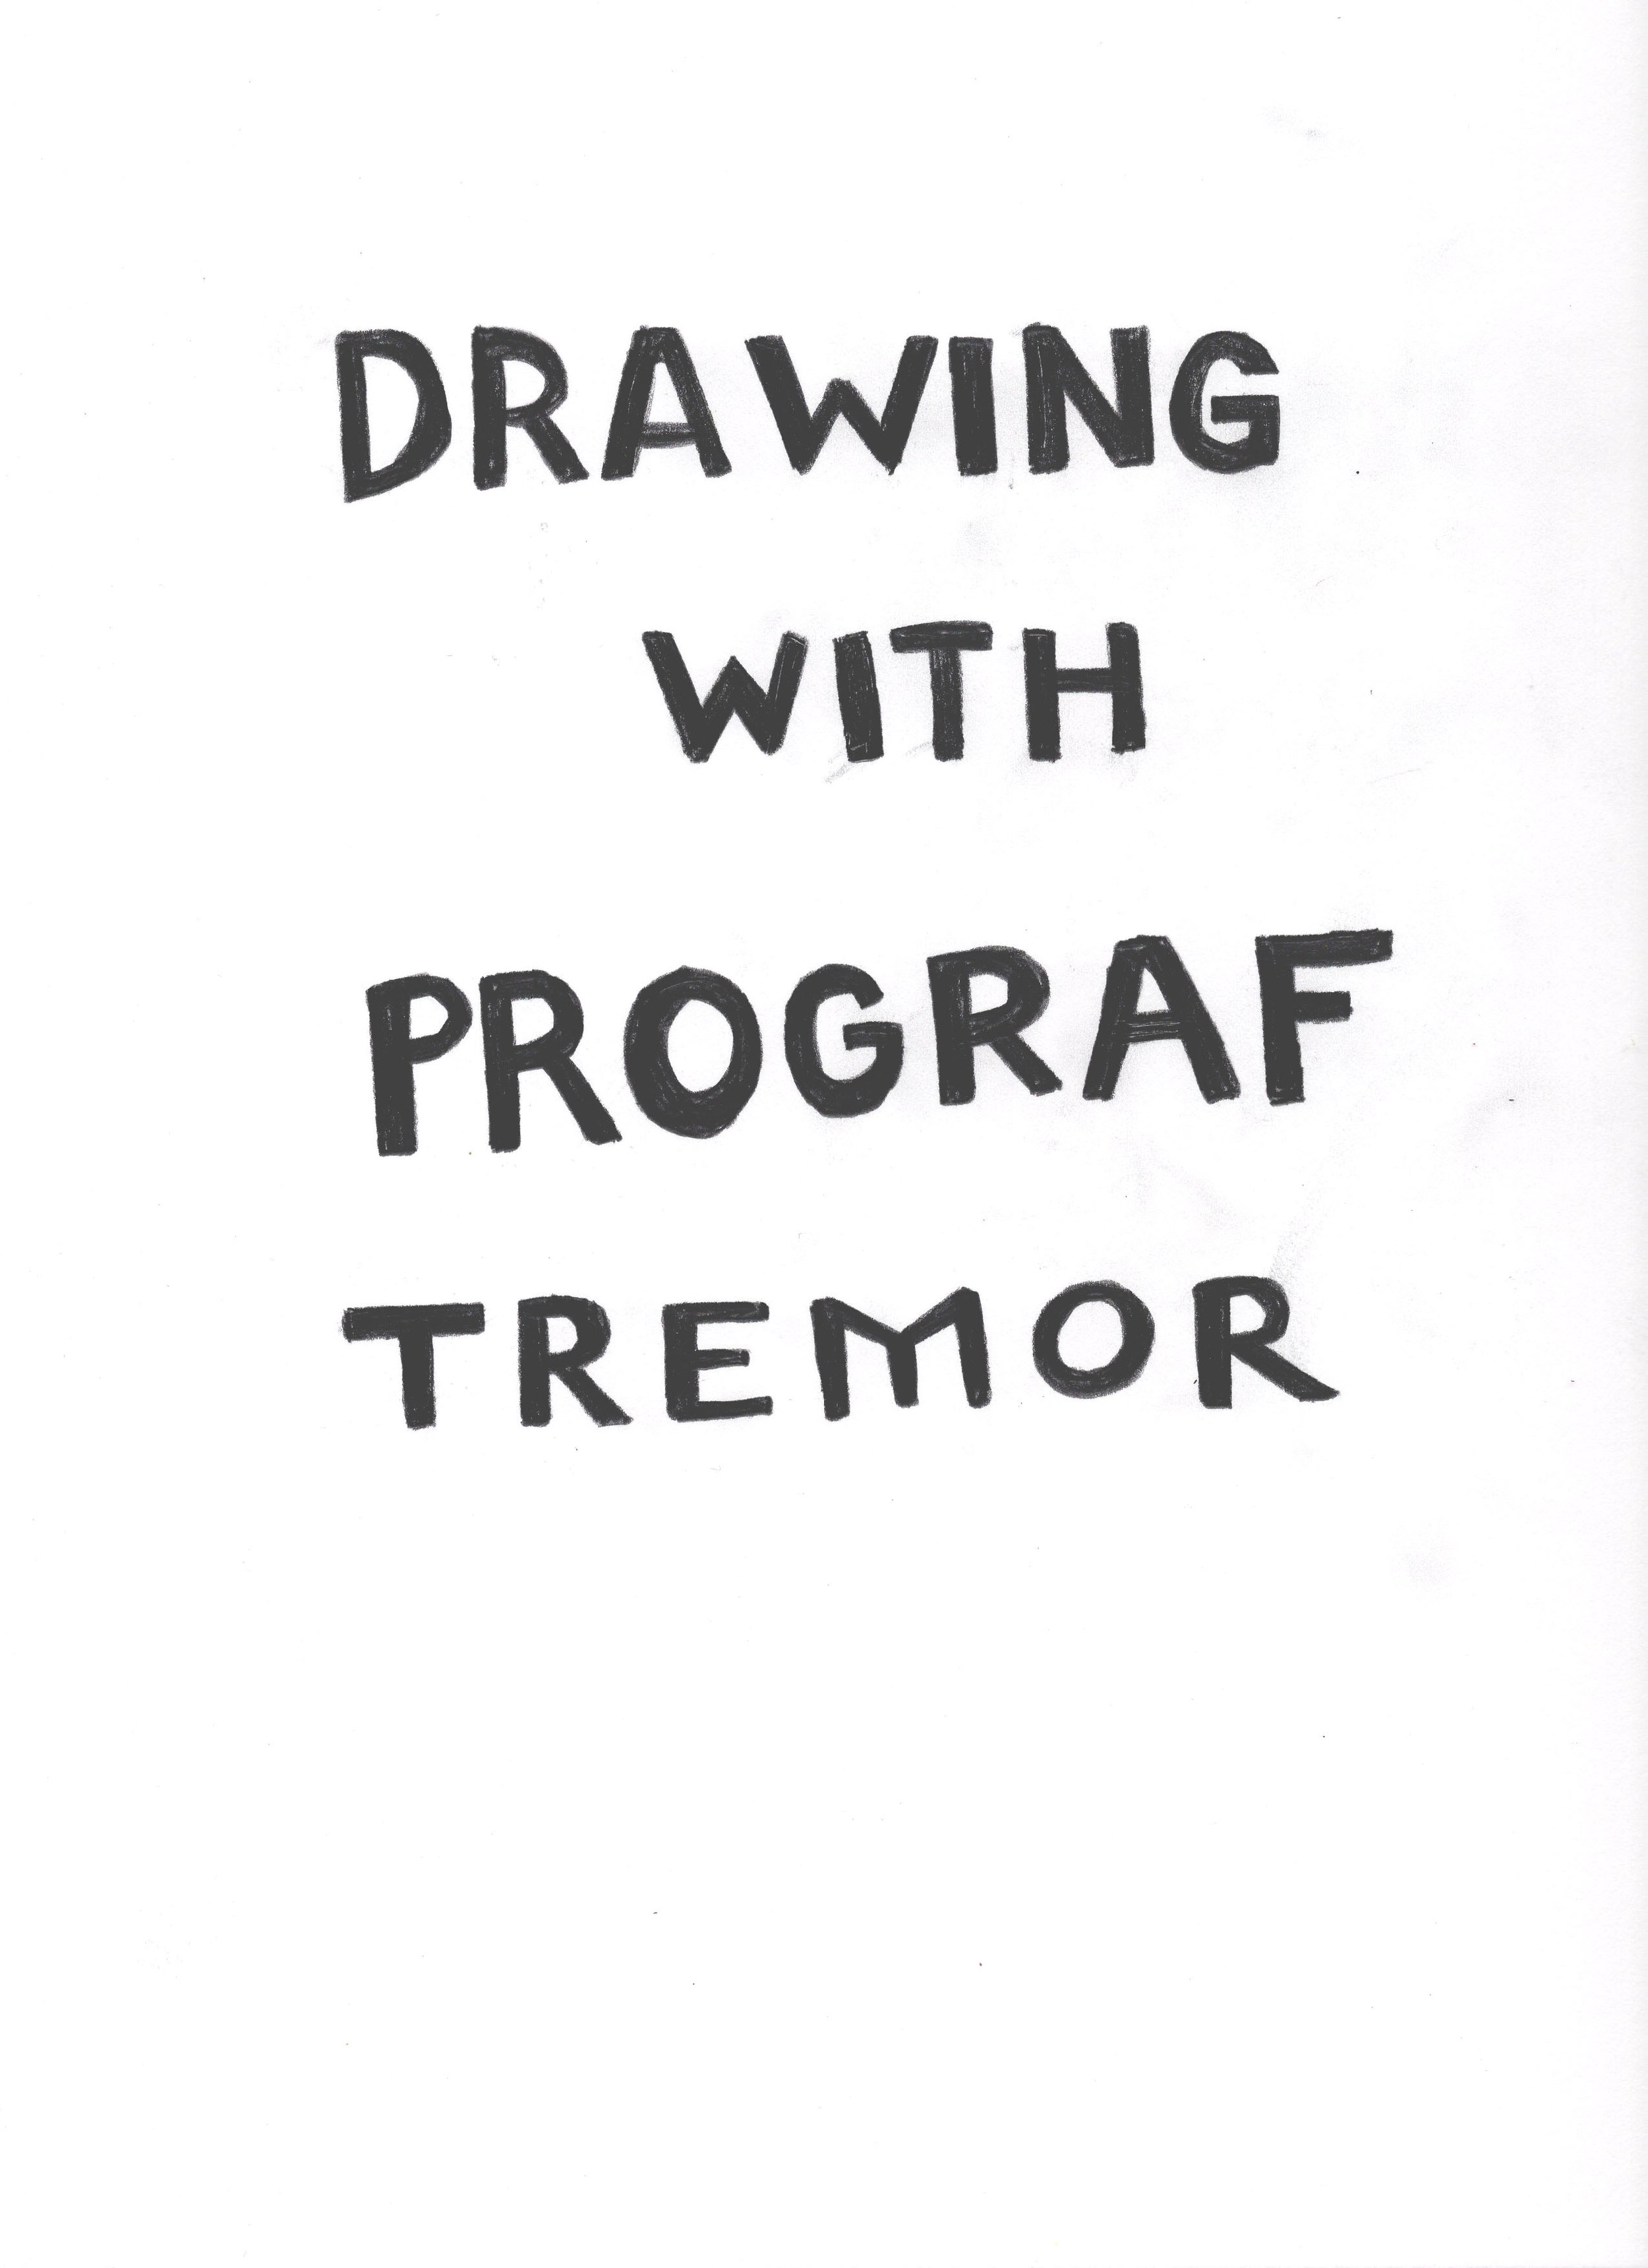 DrawingPrografTremor_2015.jpg